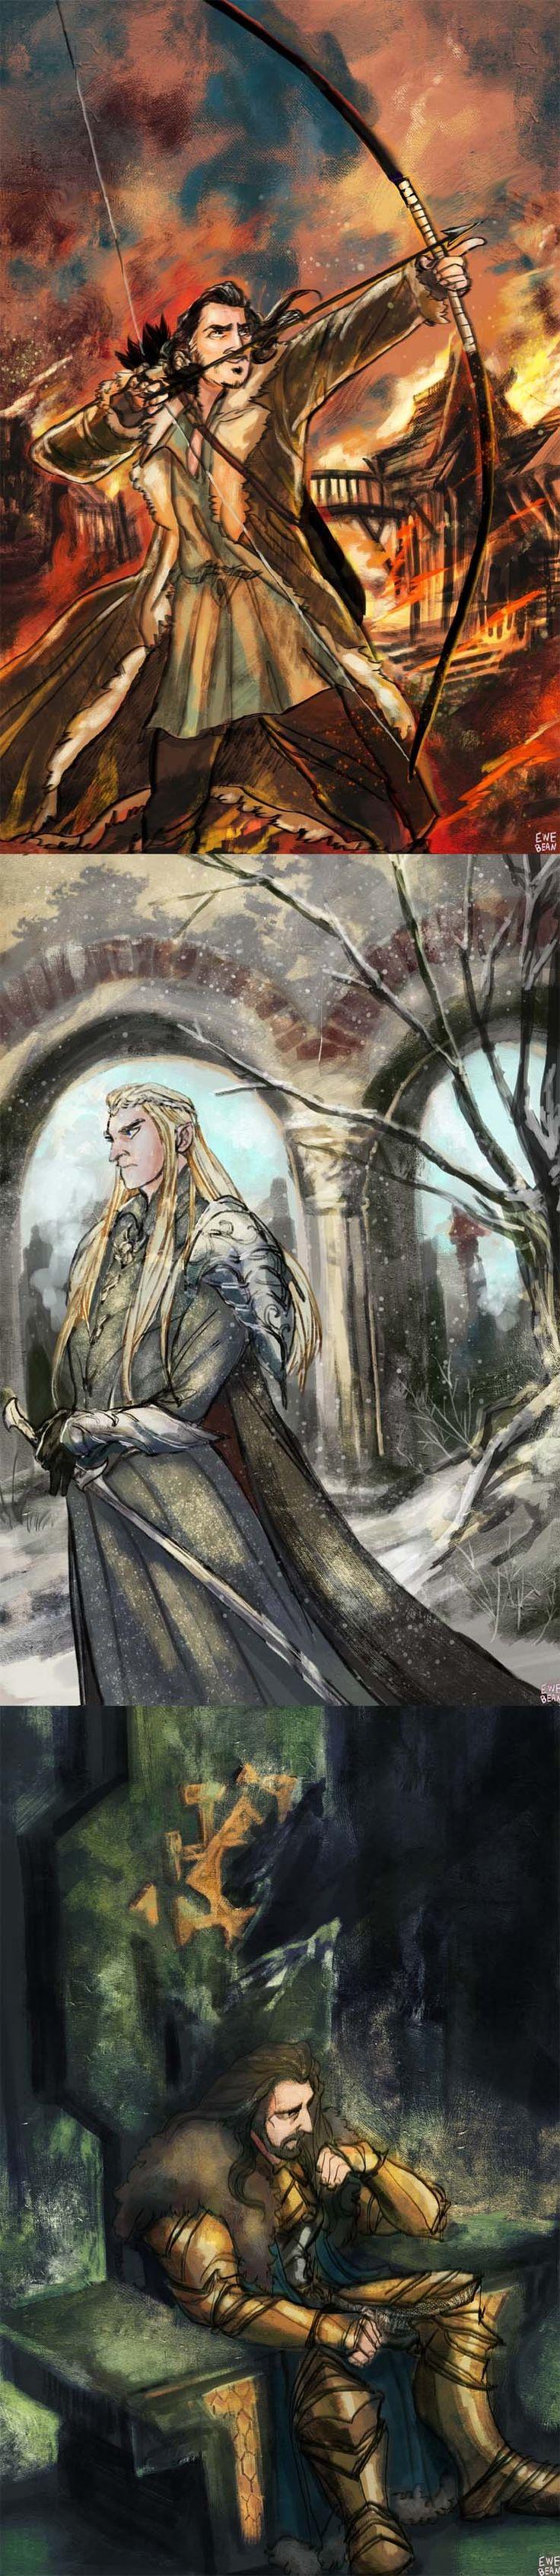 The Hobbit: The Battle of the Five Armies (Bard, Thranduil, and Thorin) by ewebean #hobbit #fanart